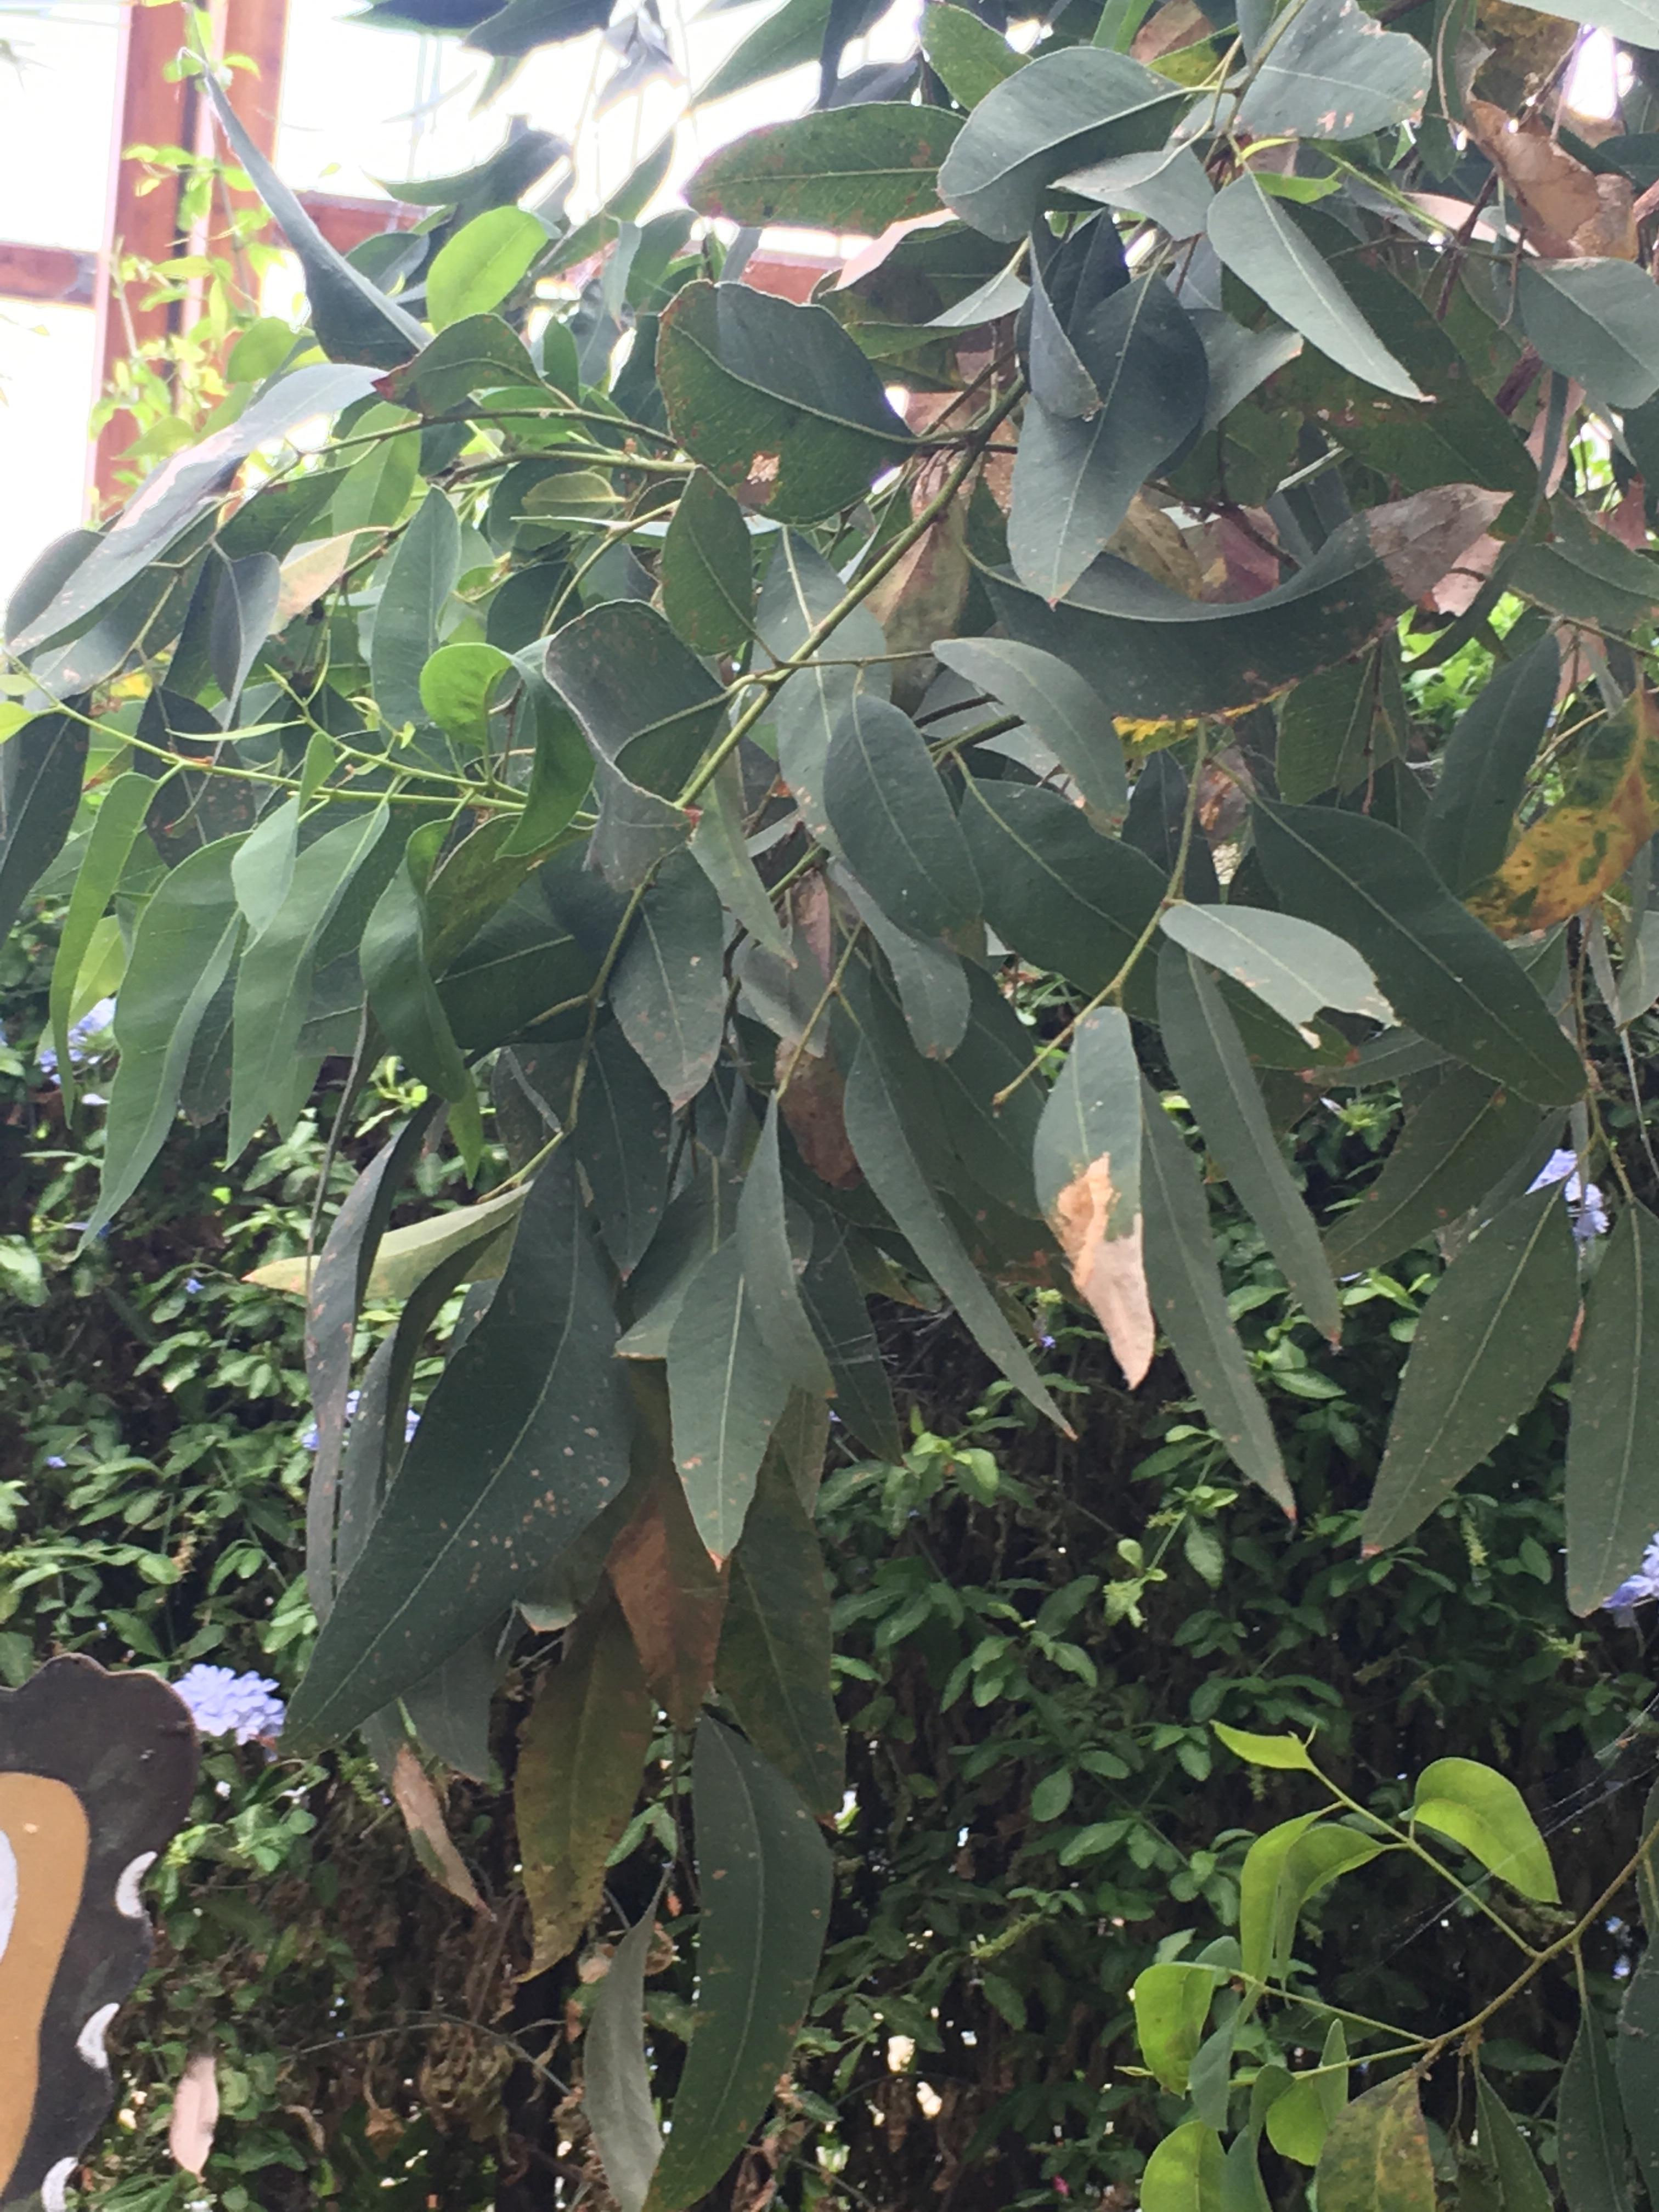 Eucalyptus, essential oils, massage, gardens, Aromatherapy, Sheffield, winter gardens, Belper, Derbyshire